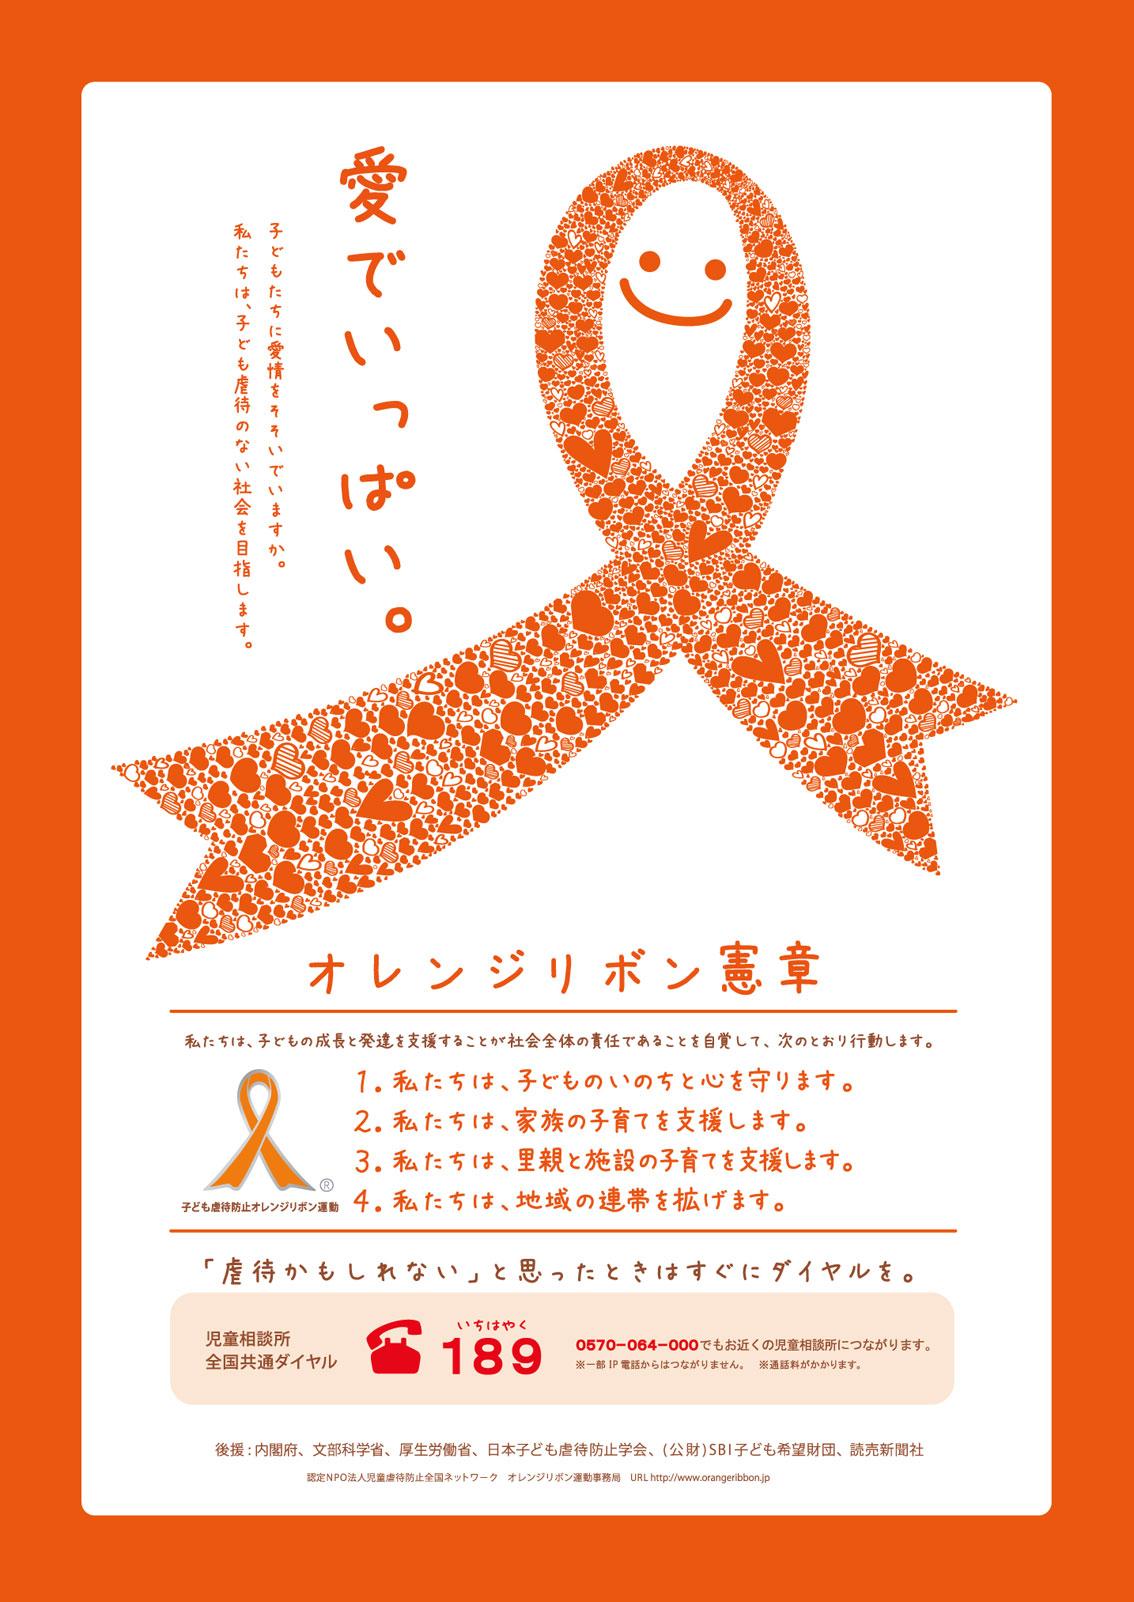 http://www.orangeribbon.jp/info/npo/contest/image/2015contest_pen.jpg